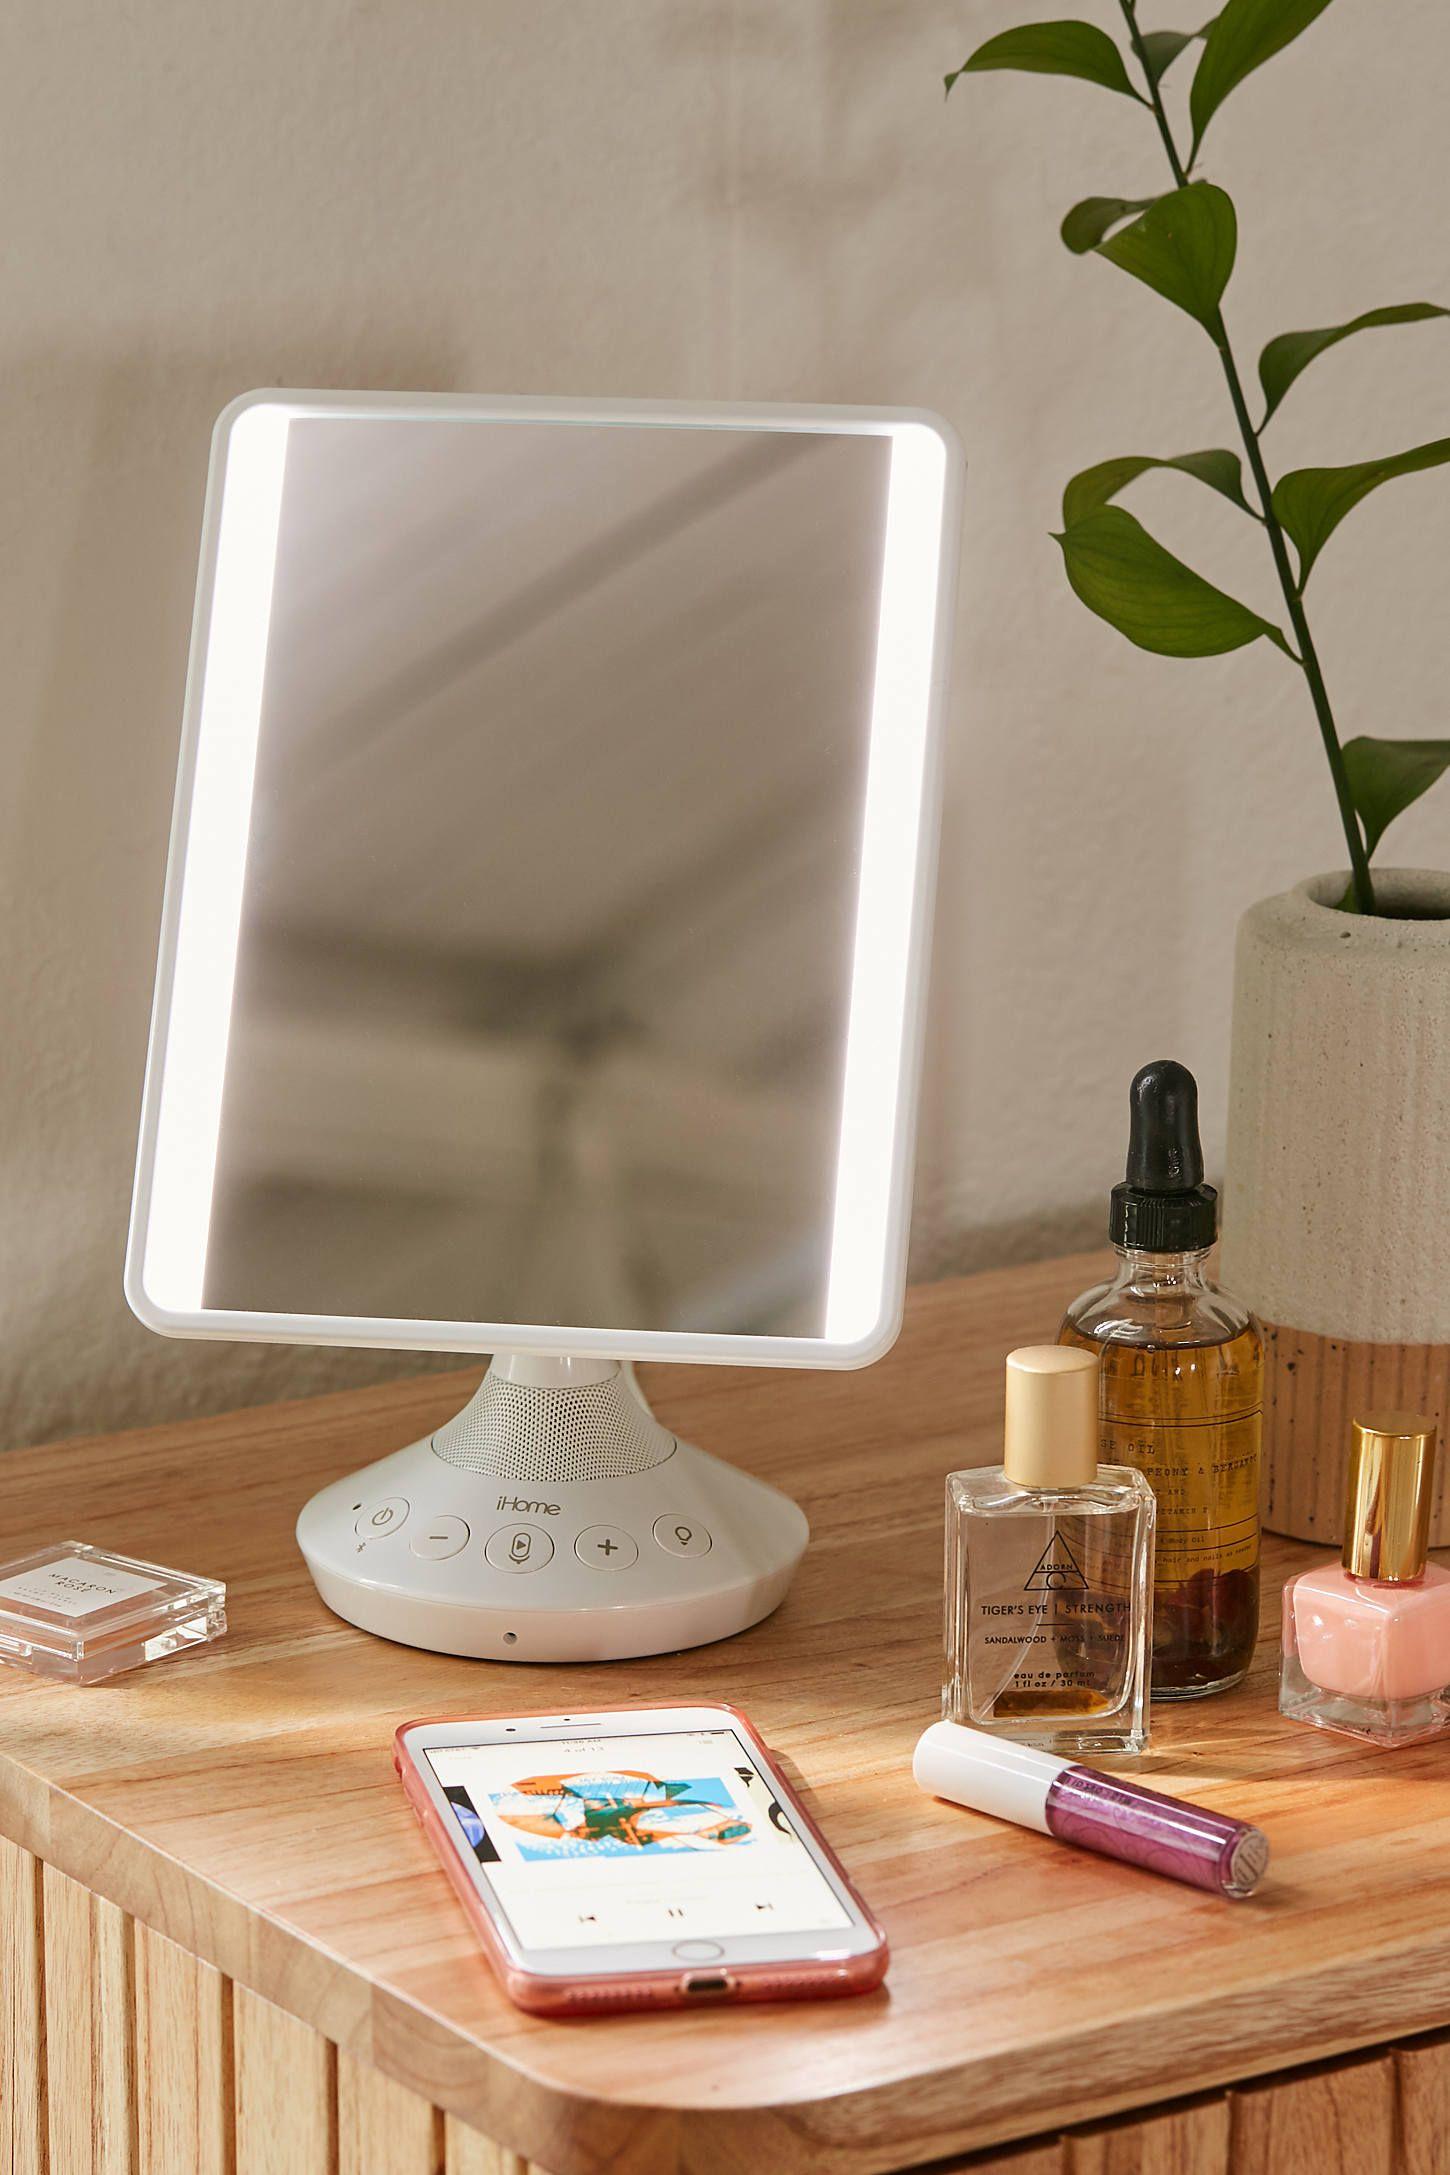 Ihome Vanity Mirror Speaker In 2019 Cool Shit Ihome